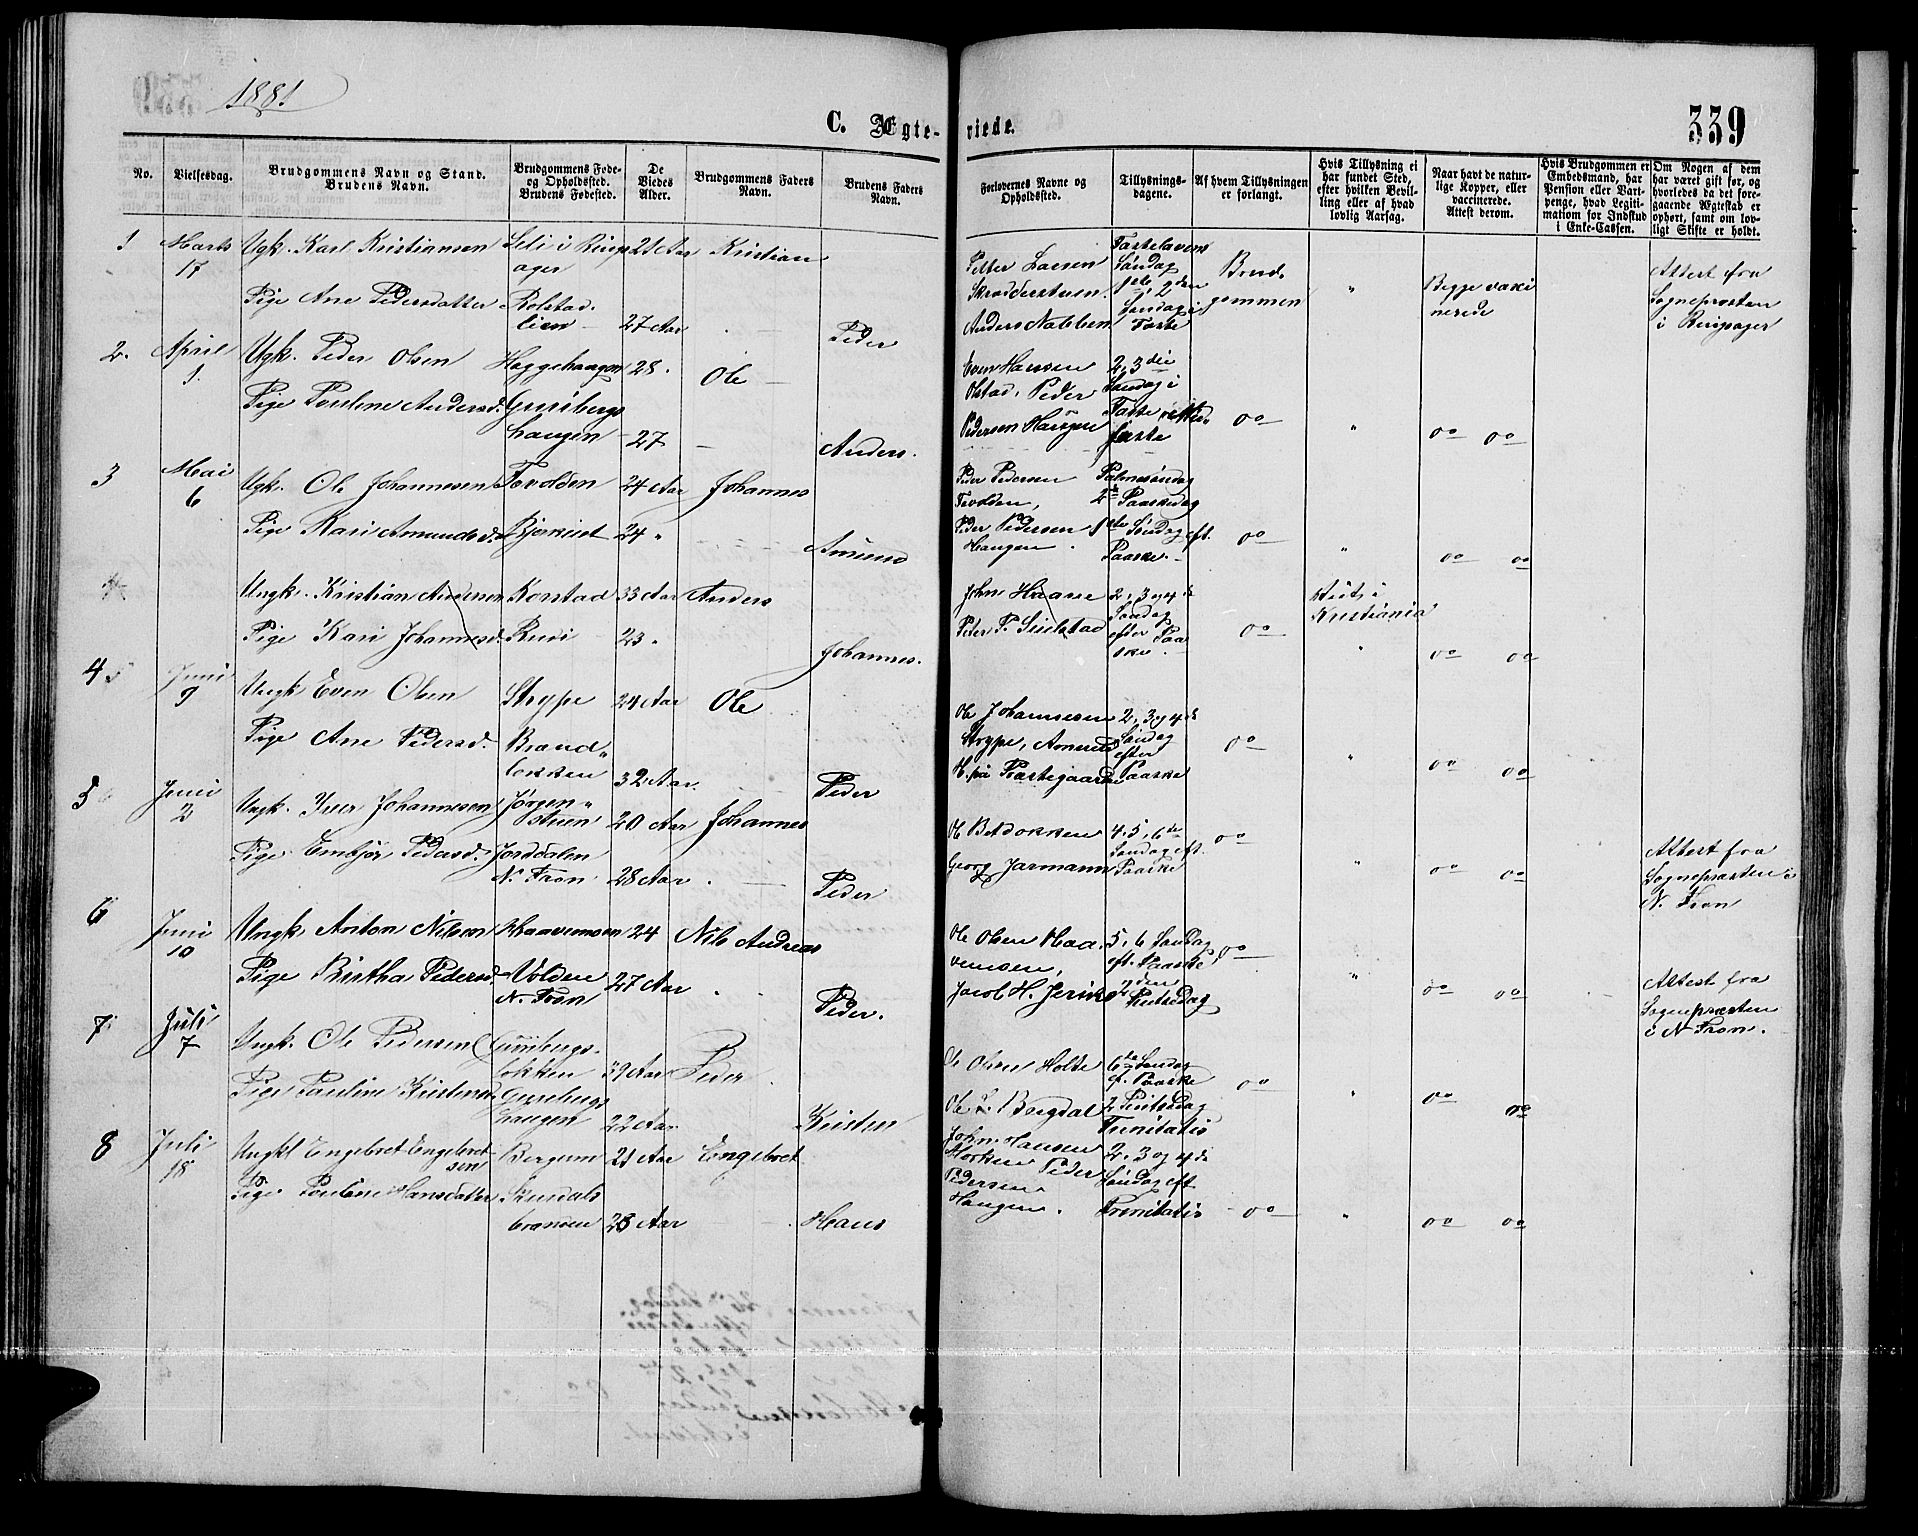 SAH, Sør-Fron prestekontor, H/Ha/Hab/L0002: Klokkerbok nr. 2, 1864-1883, s. 339